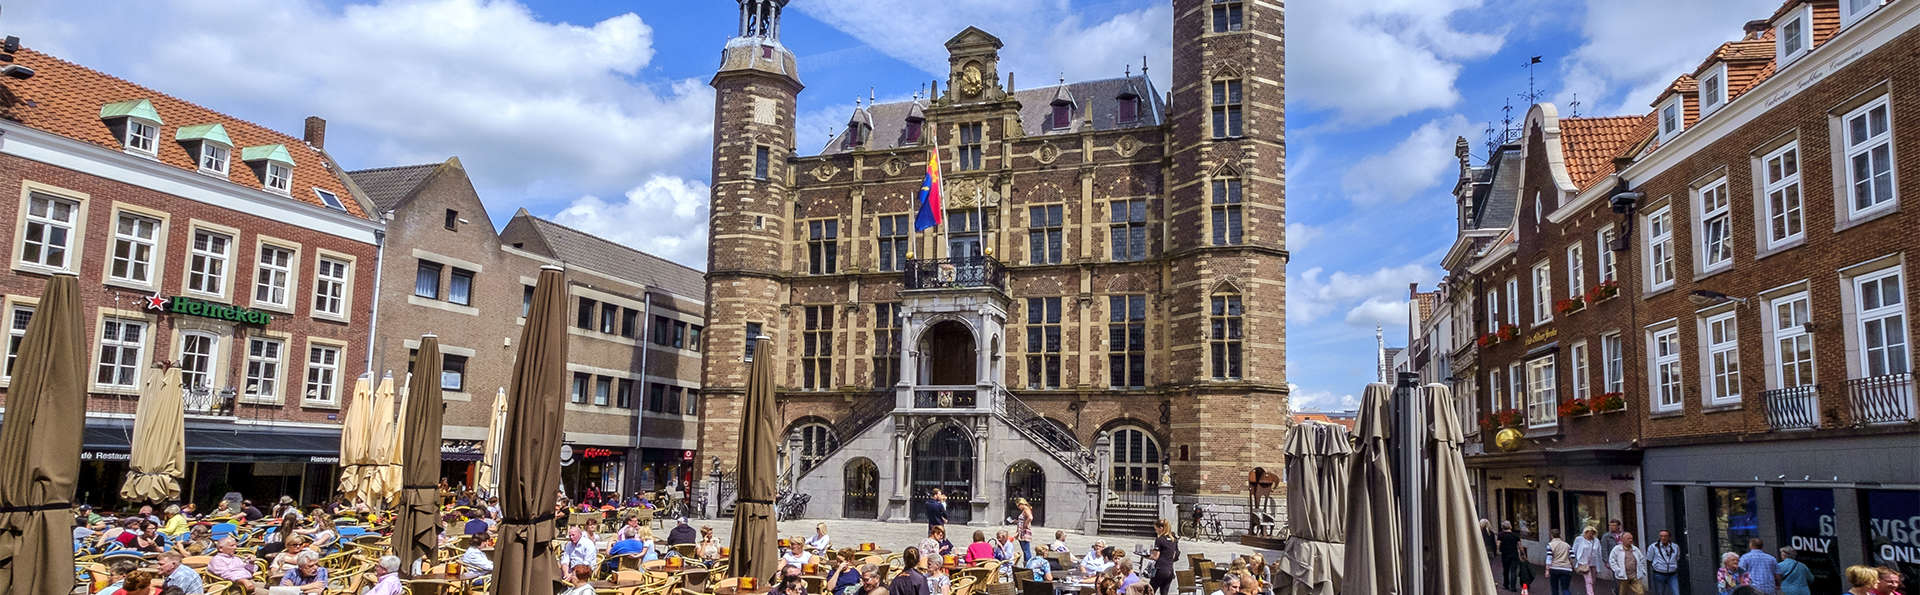 Parkhotel Horst - Venlo - EDIT_Destination_Venlo.jpg